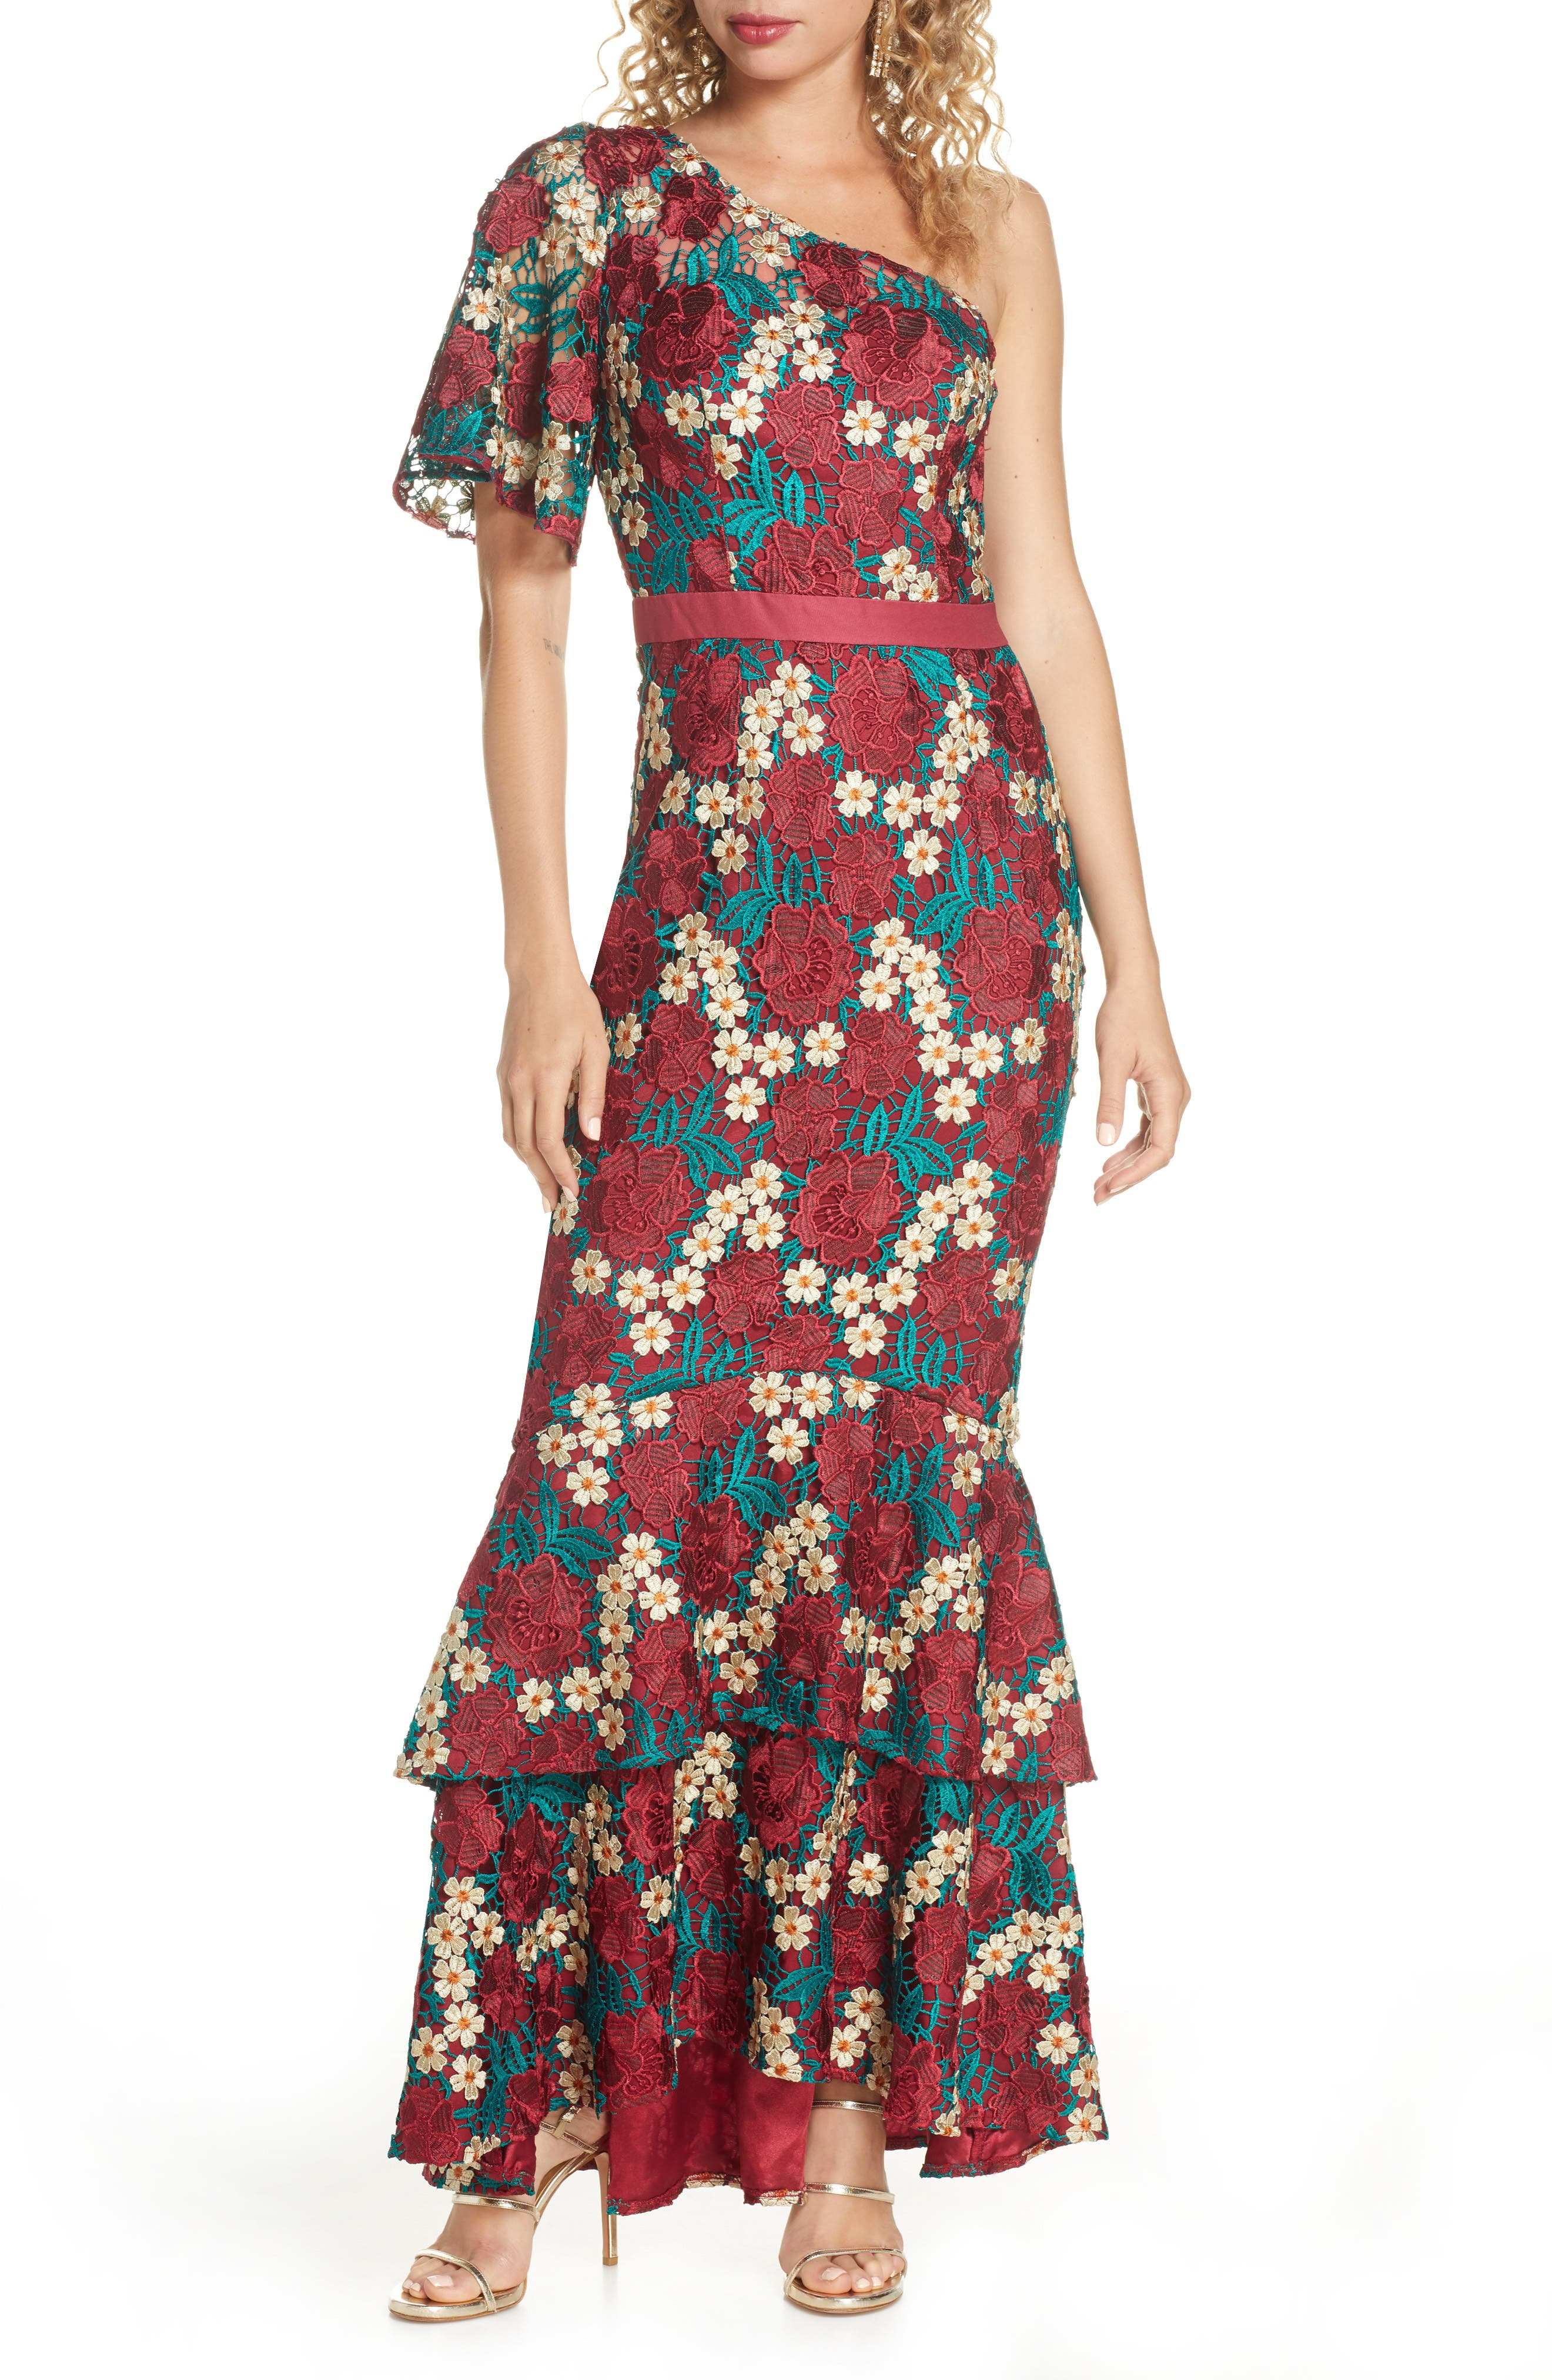 1930s Evening Dresses | Old Hollywood Dress Womens Chi Chi London Jennifer One-Shoulder Crochet Lace Evening Gown $135.00 AT vintagedancer.com